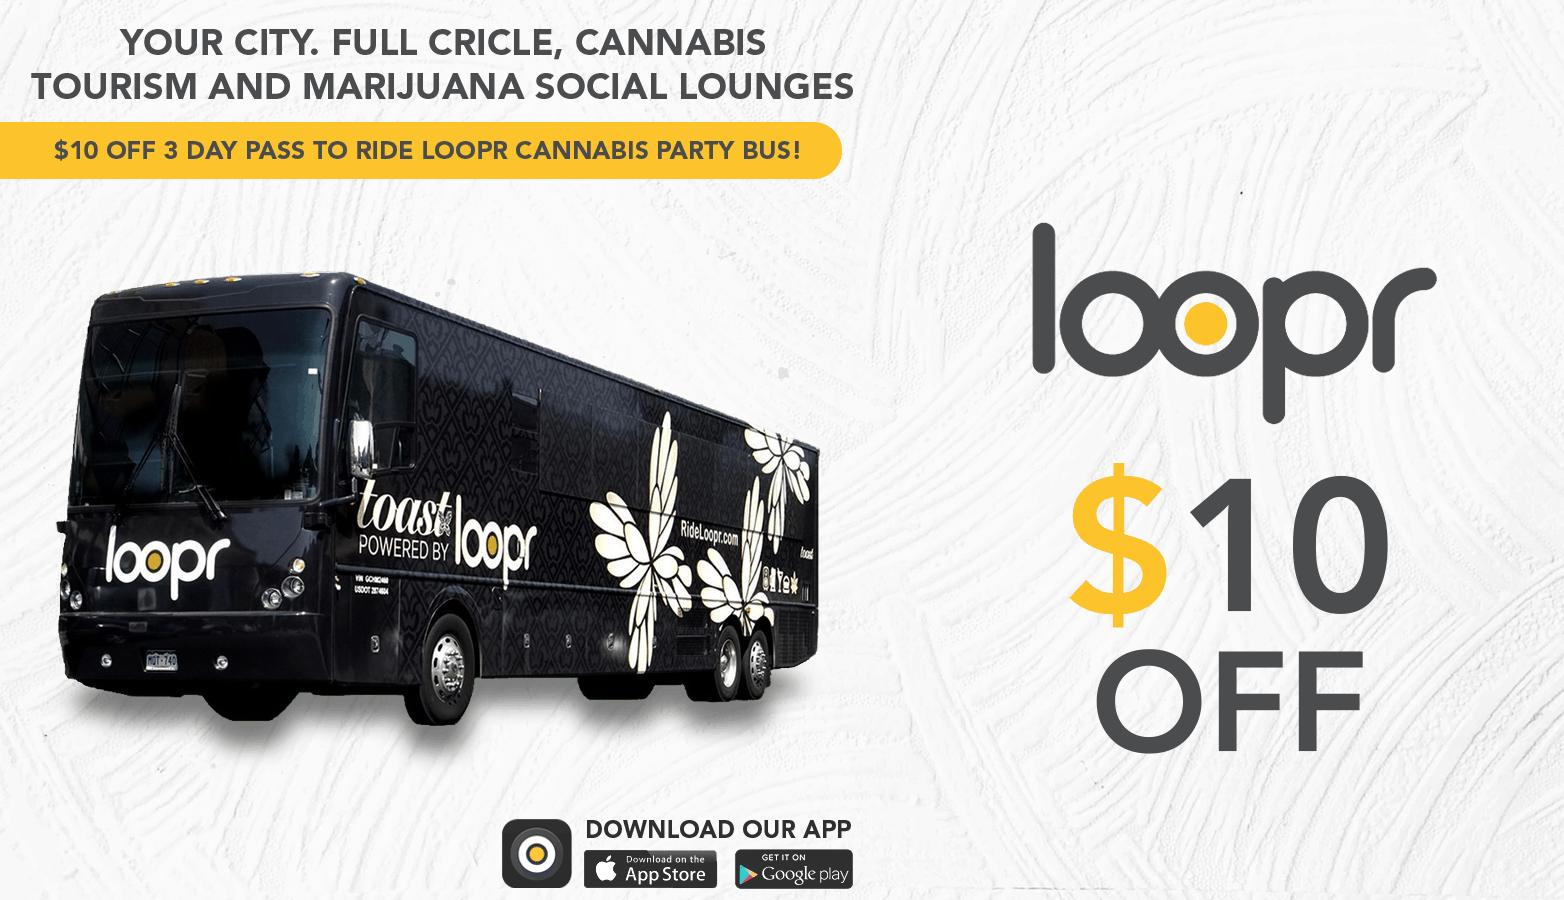 Loopr Cannabis Denver Party Bus Exterior - Save On Cannabis online Website.